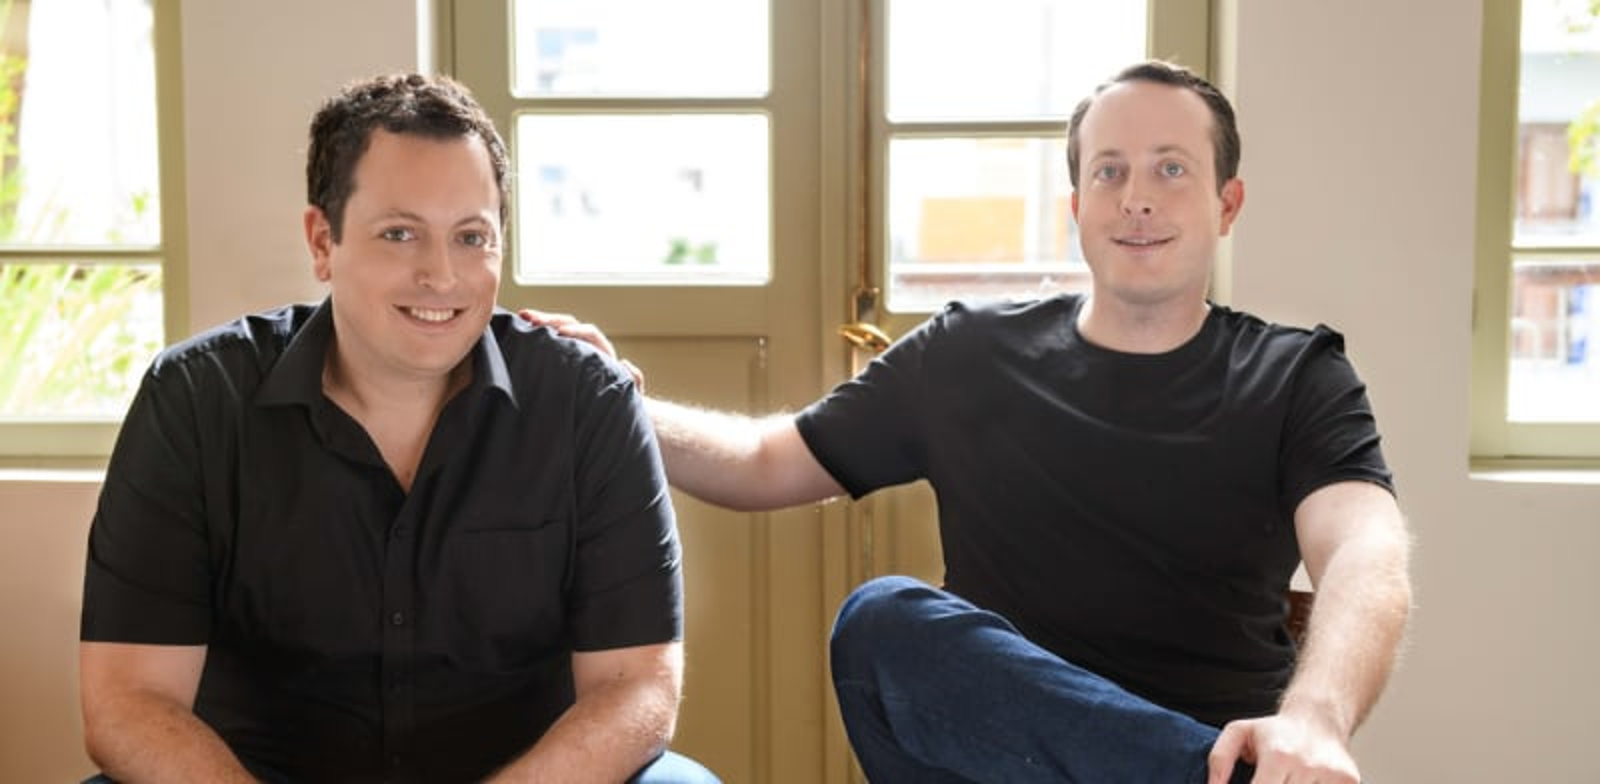 Michael and Daniel Gabay. Credit: Tom Bartov